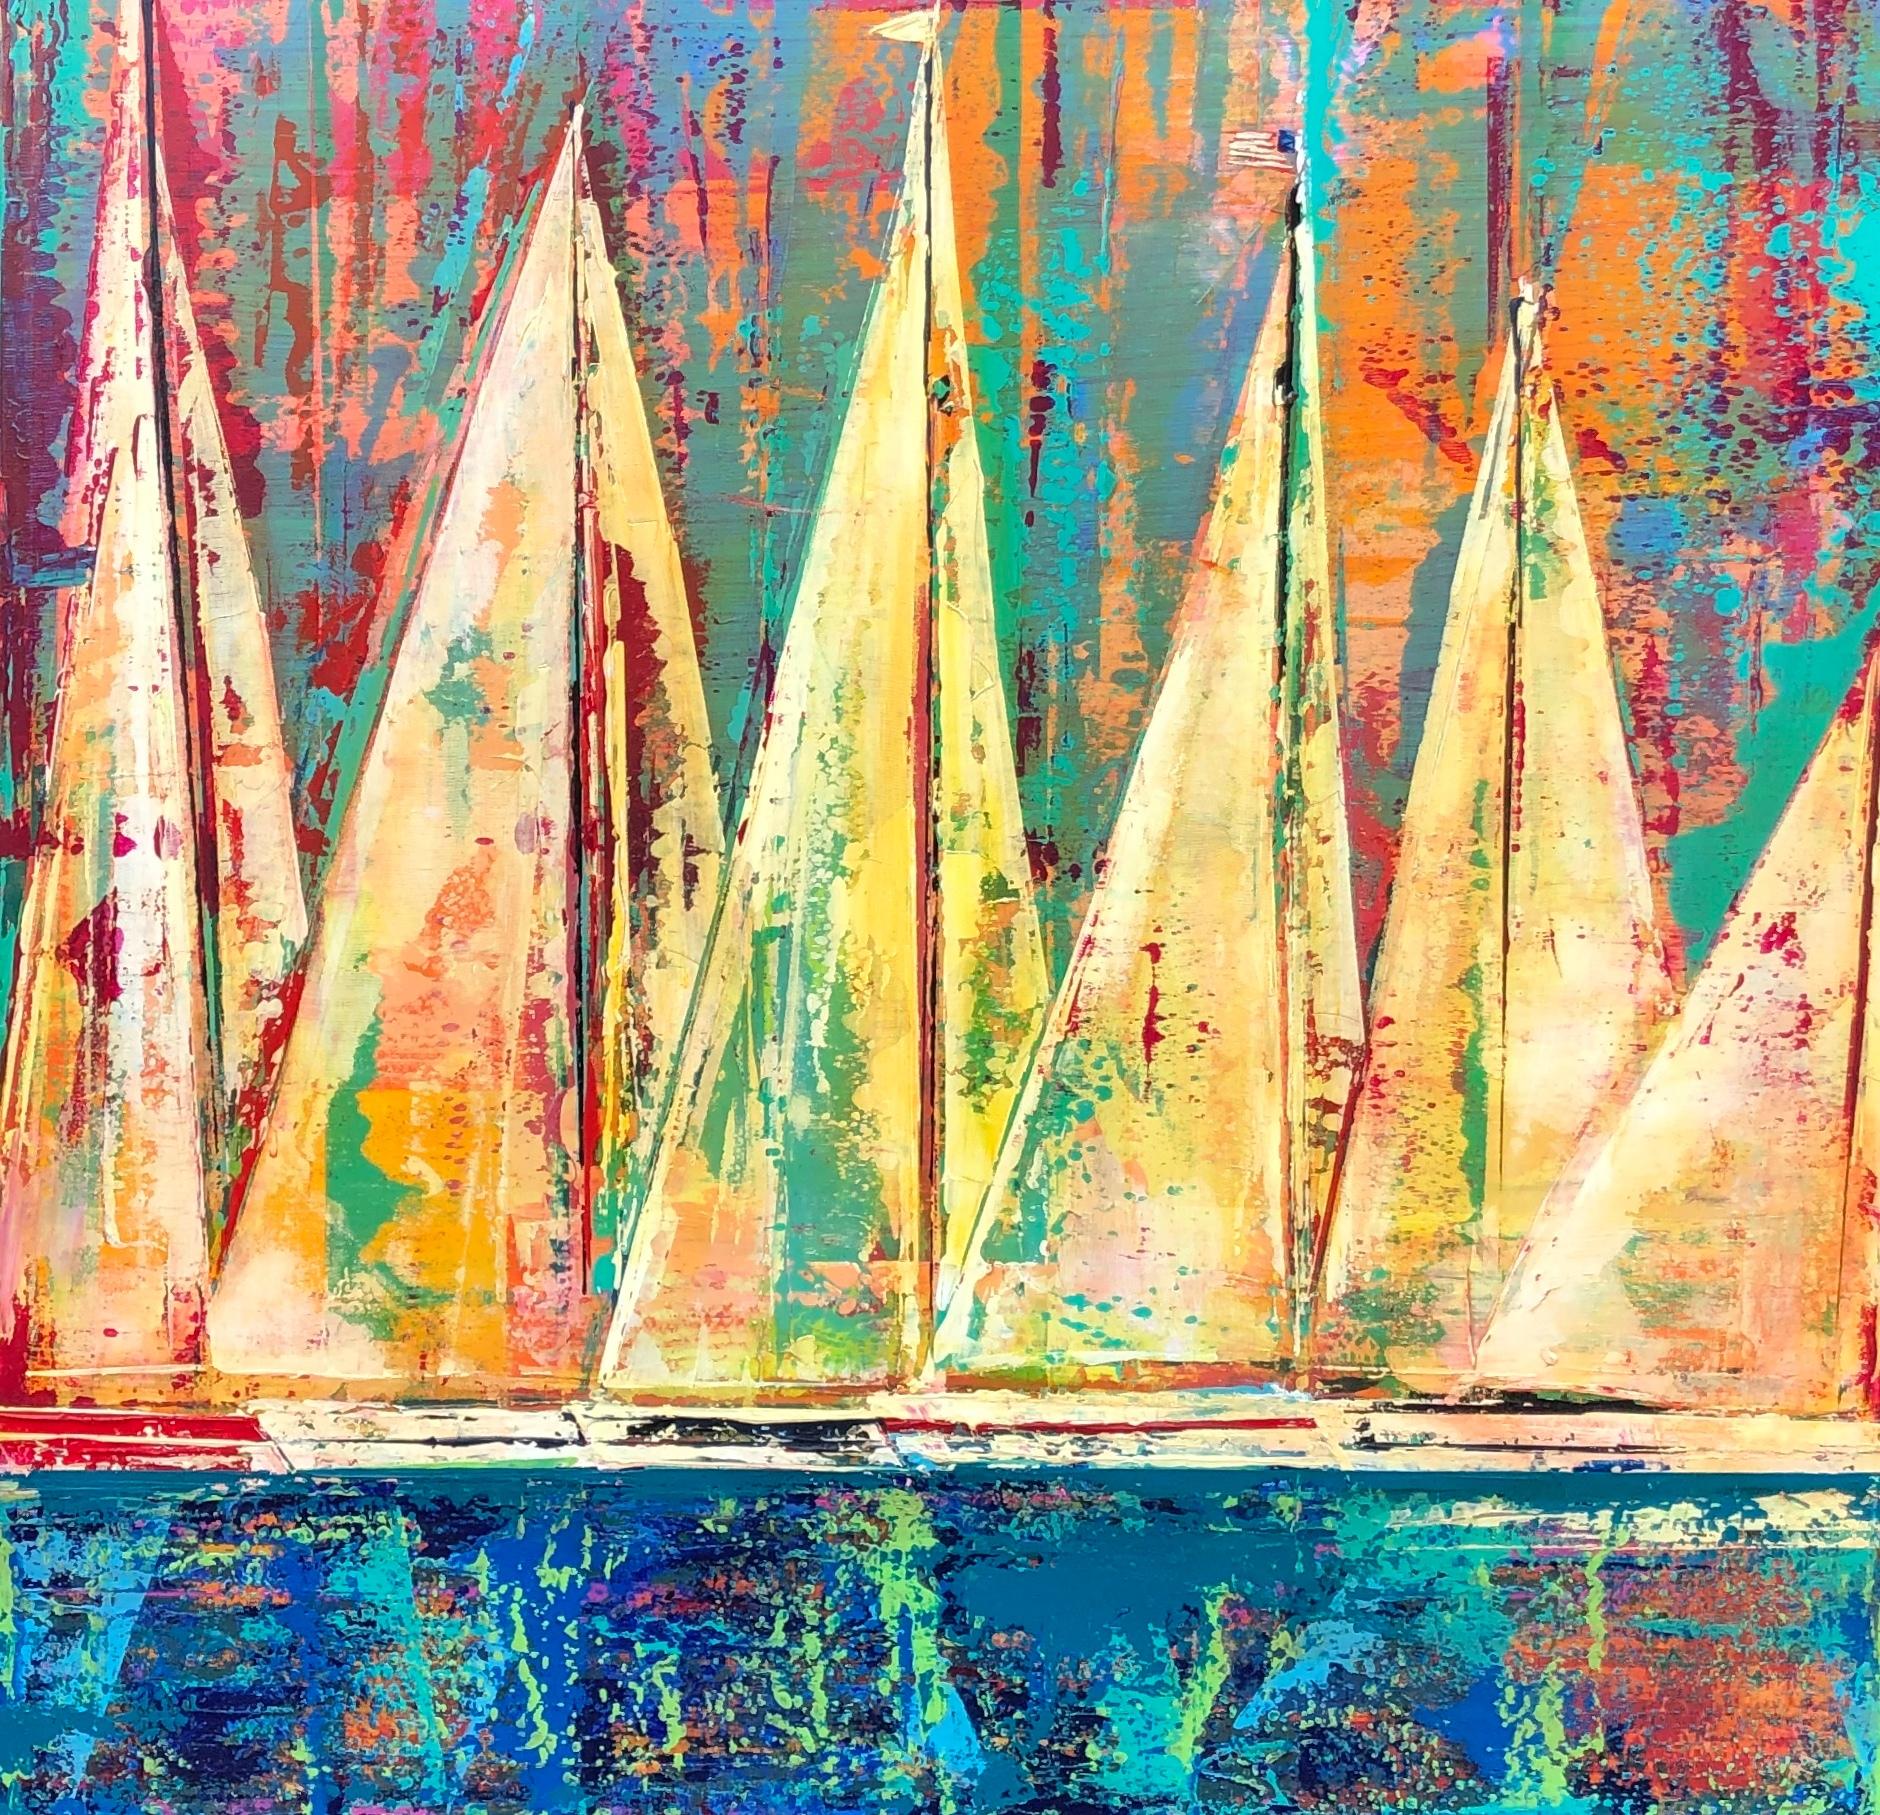 Sail boats txq6dl